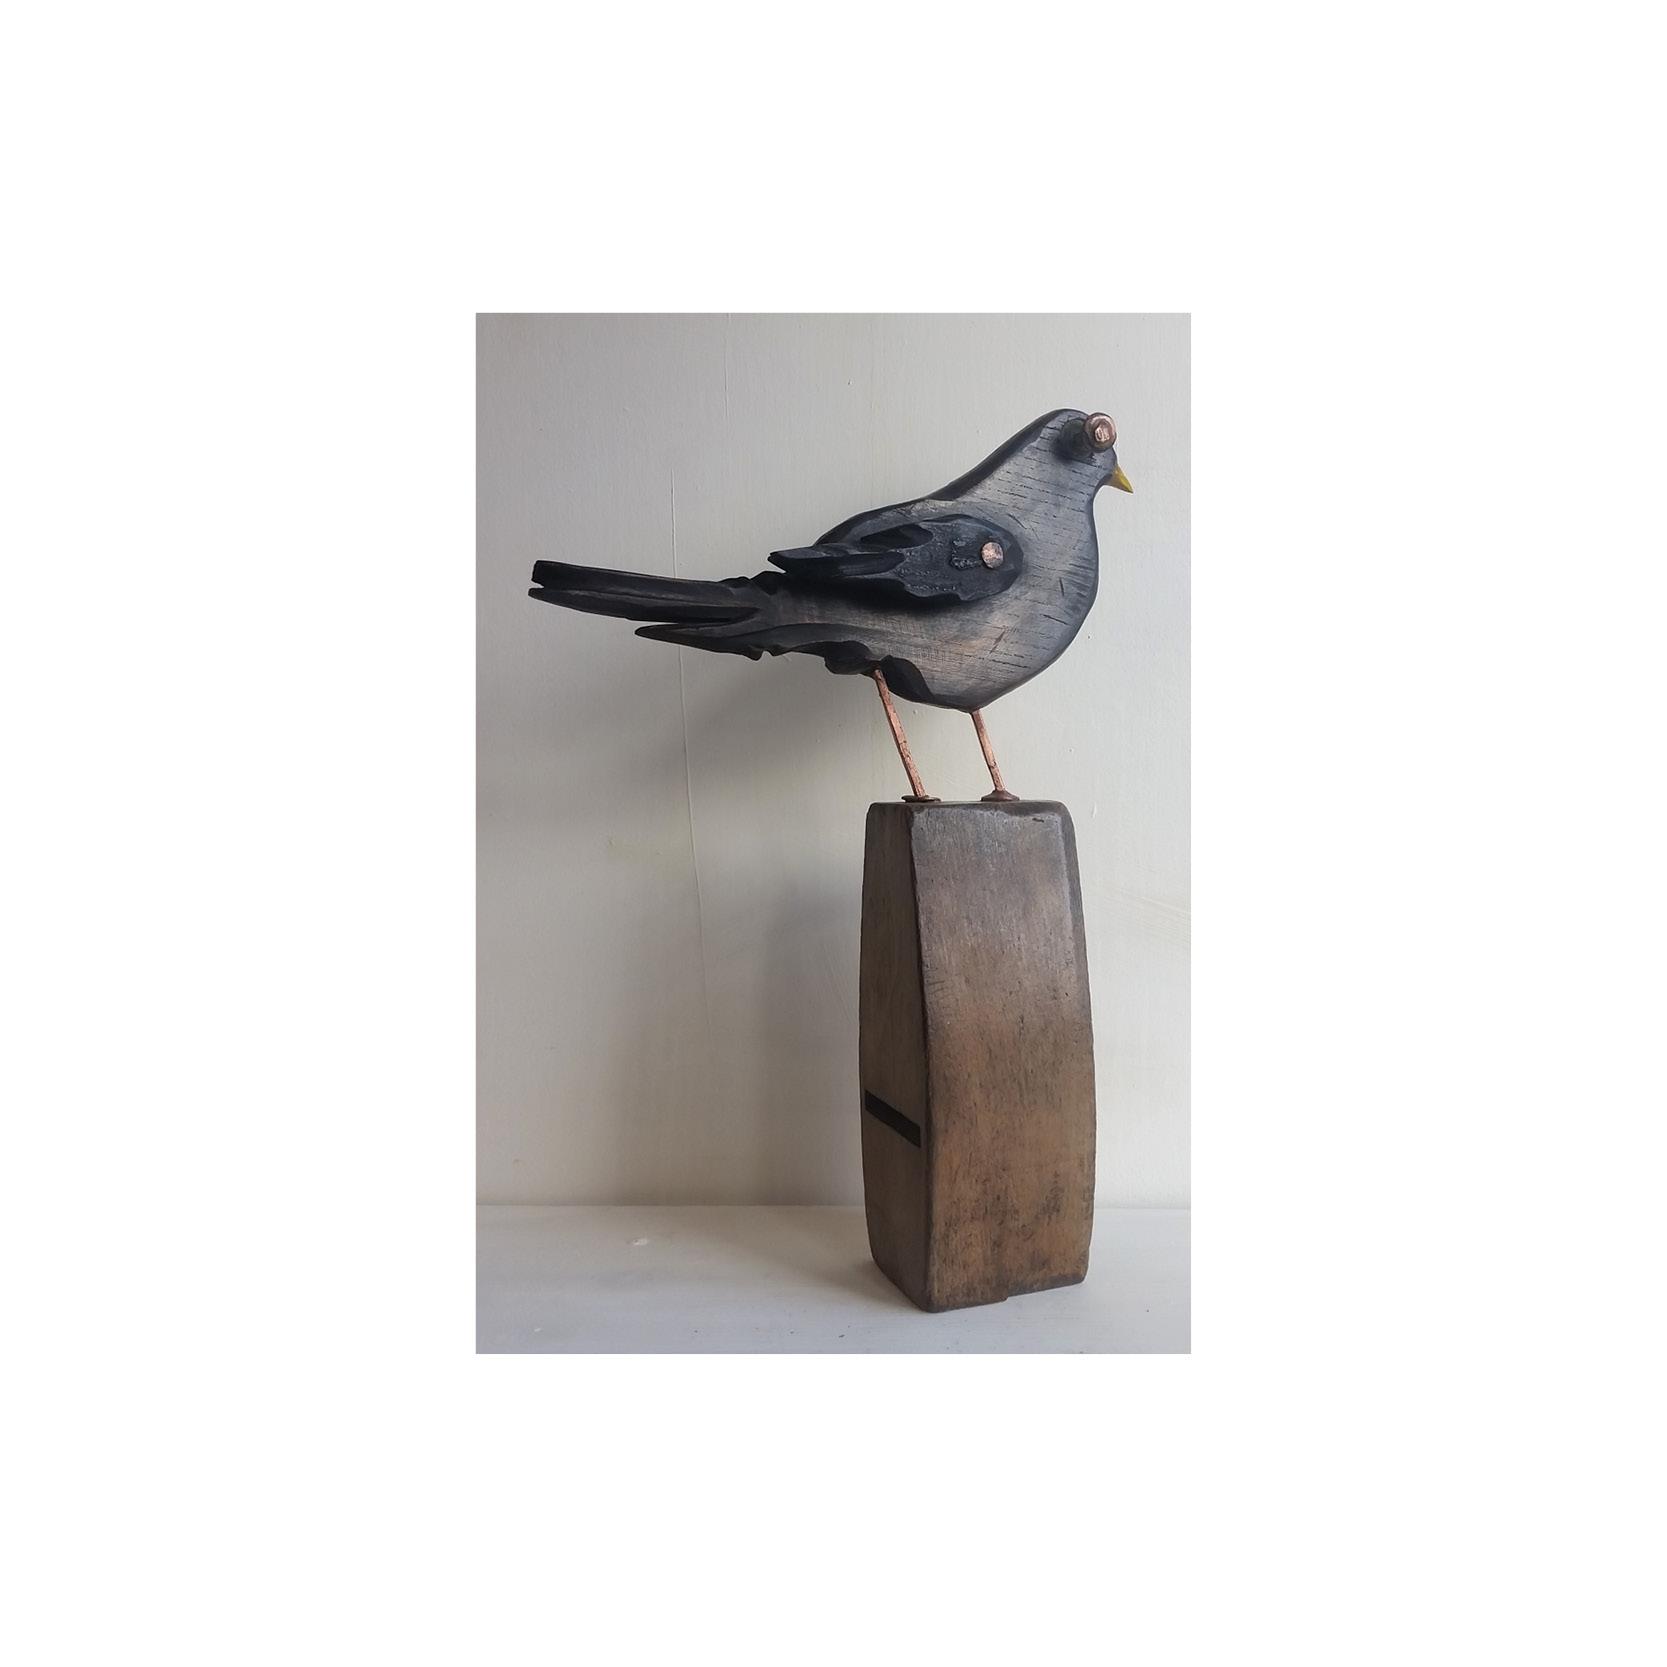 Nic Acaster - RX320 blackbird